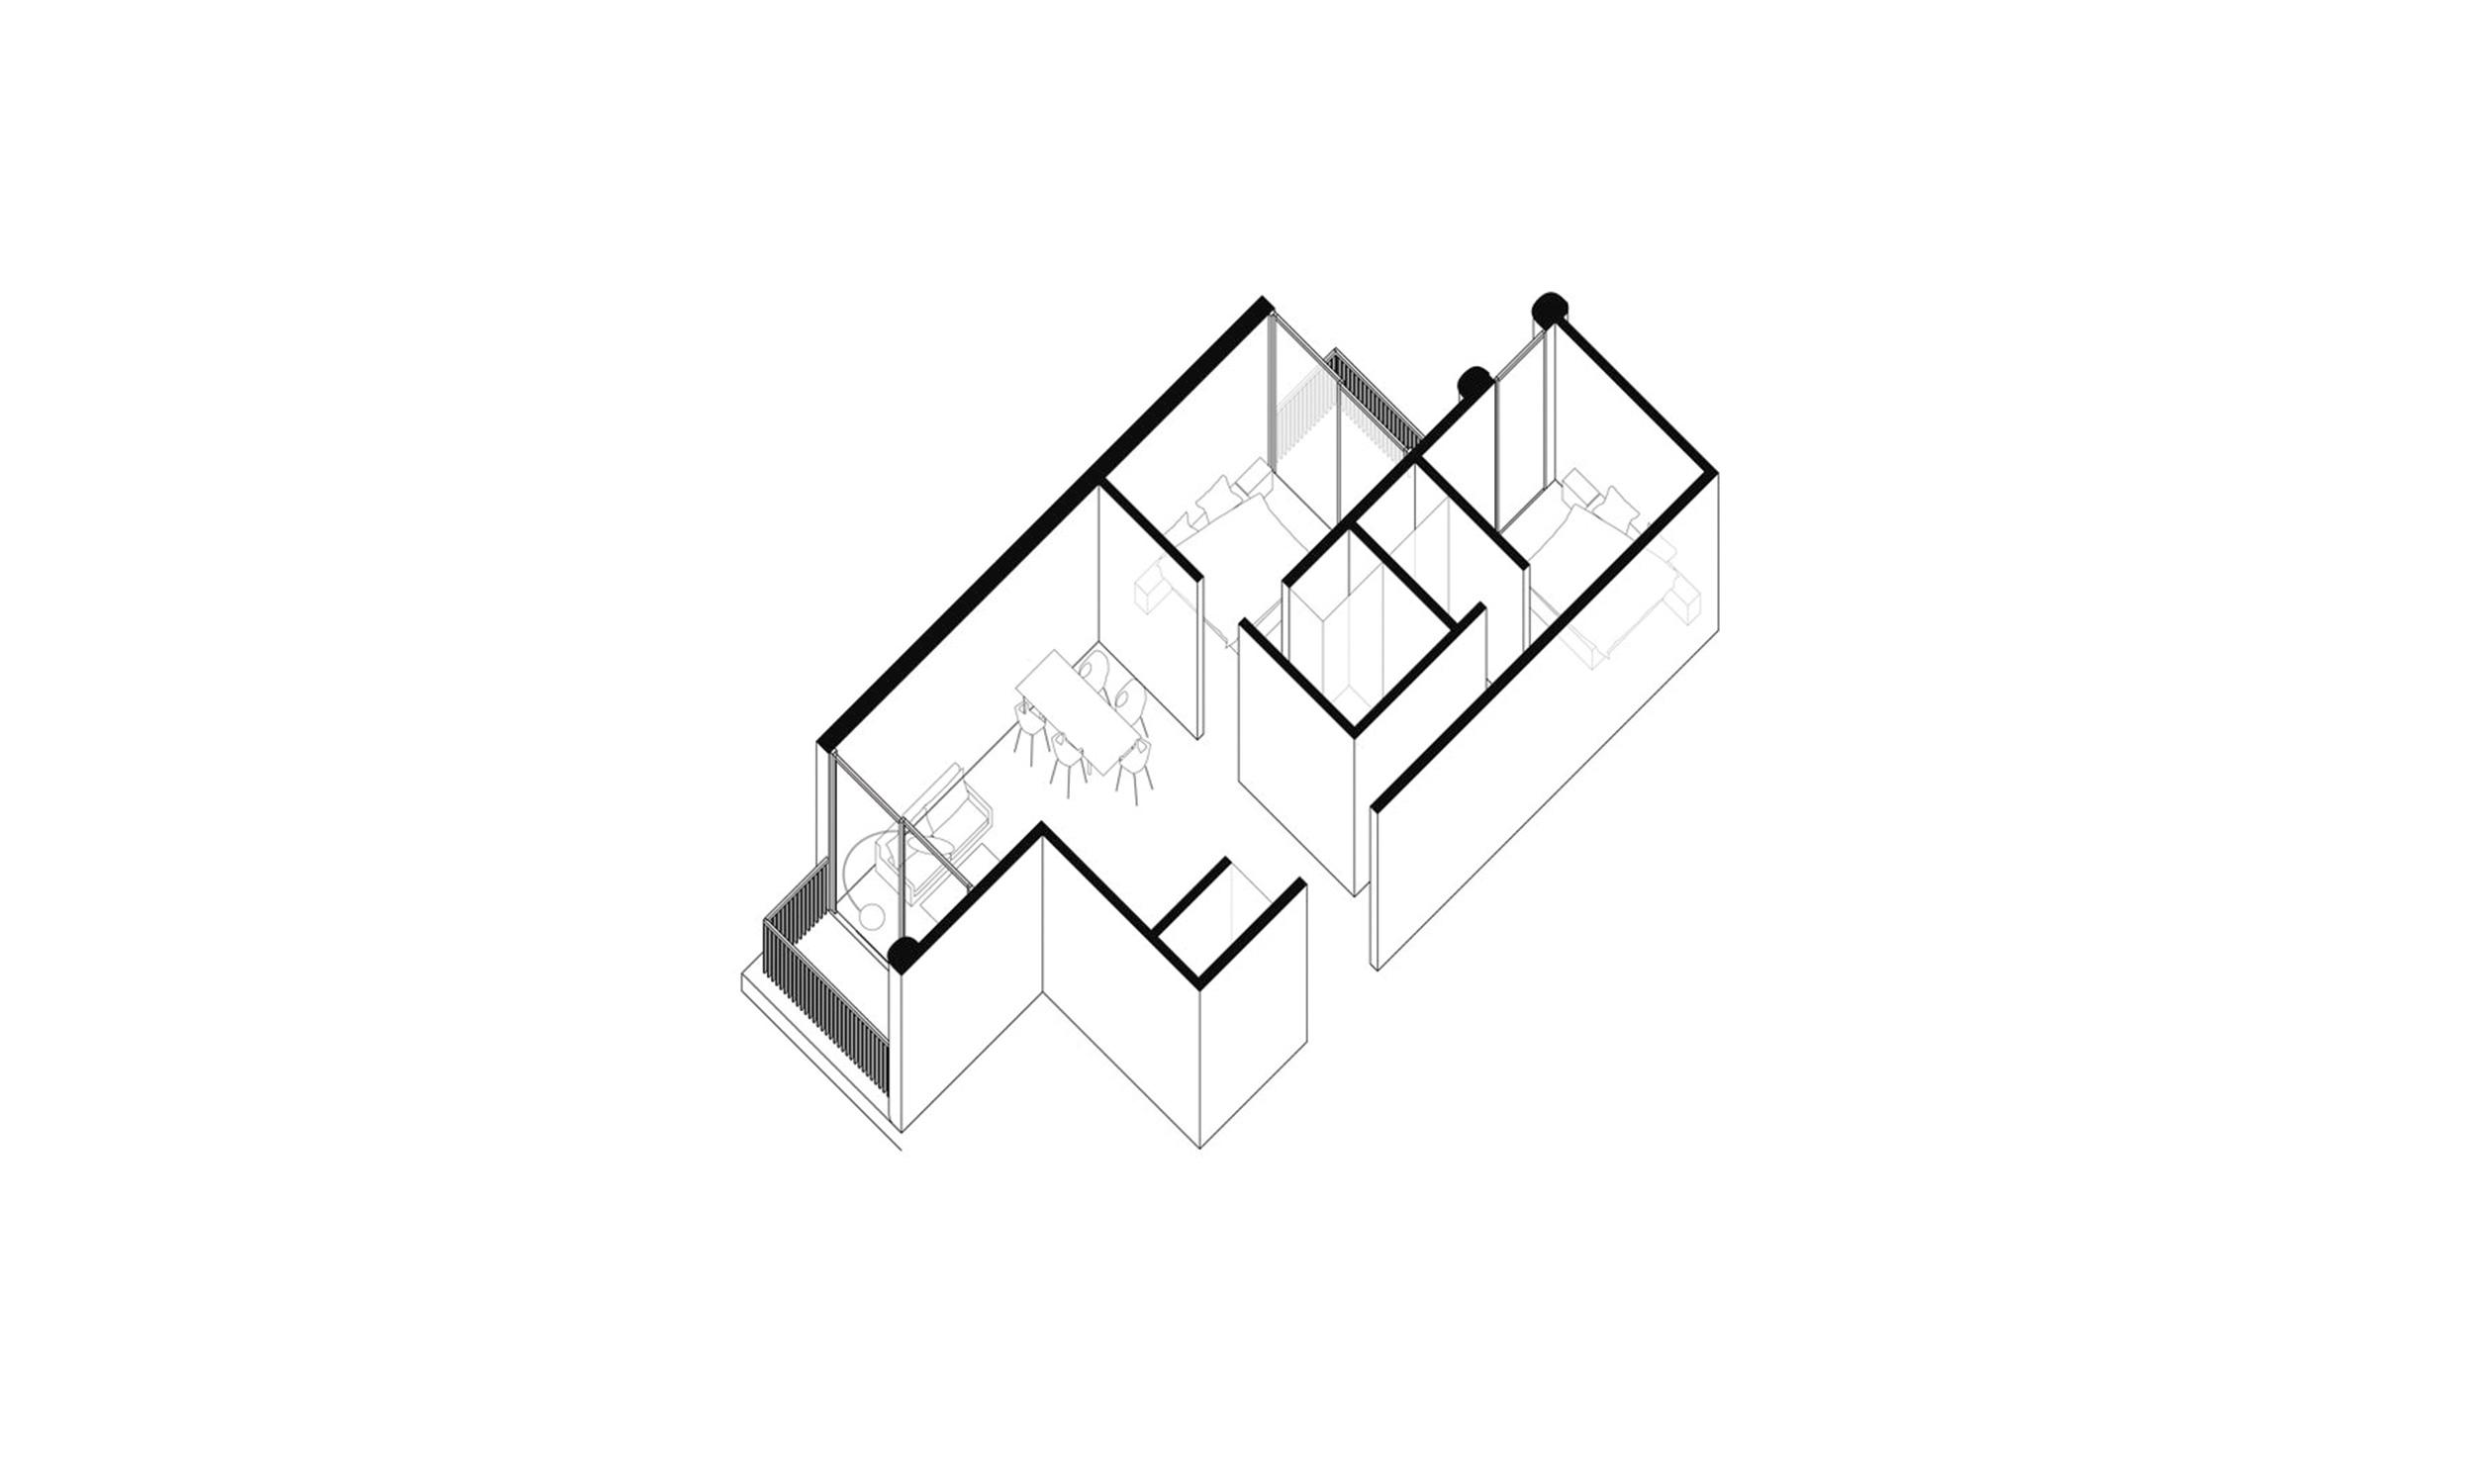 main_office_justo_sierra_axonometri_2update